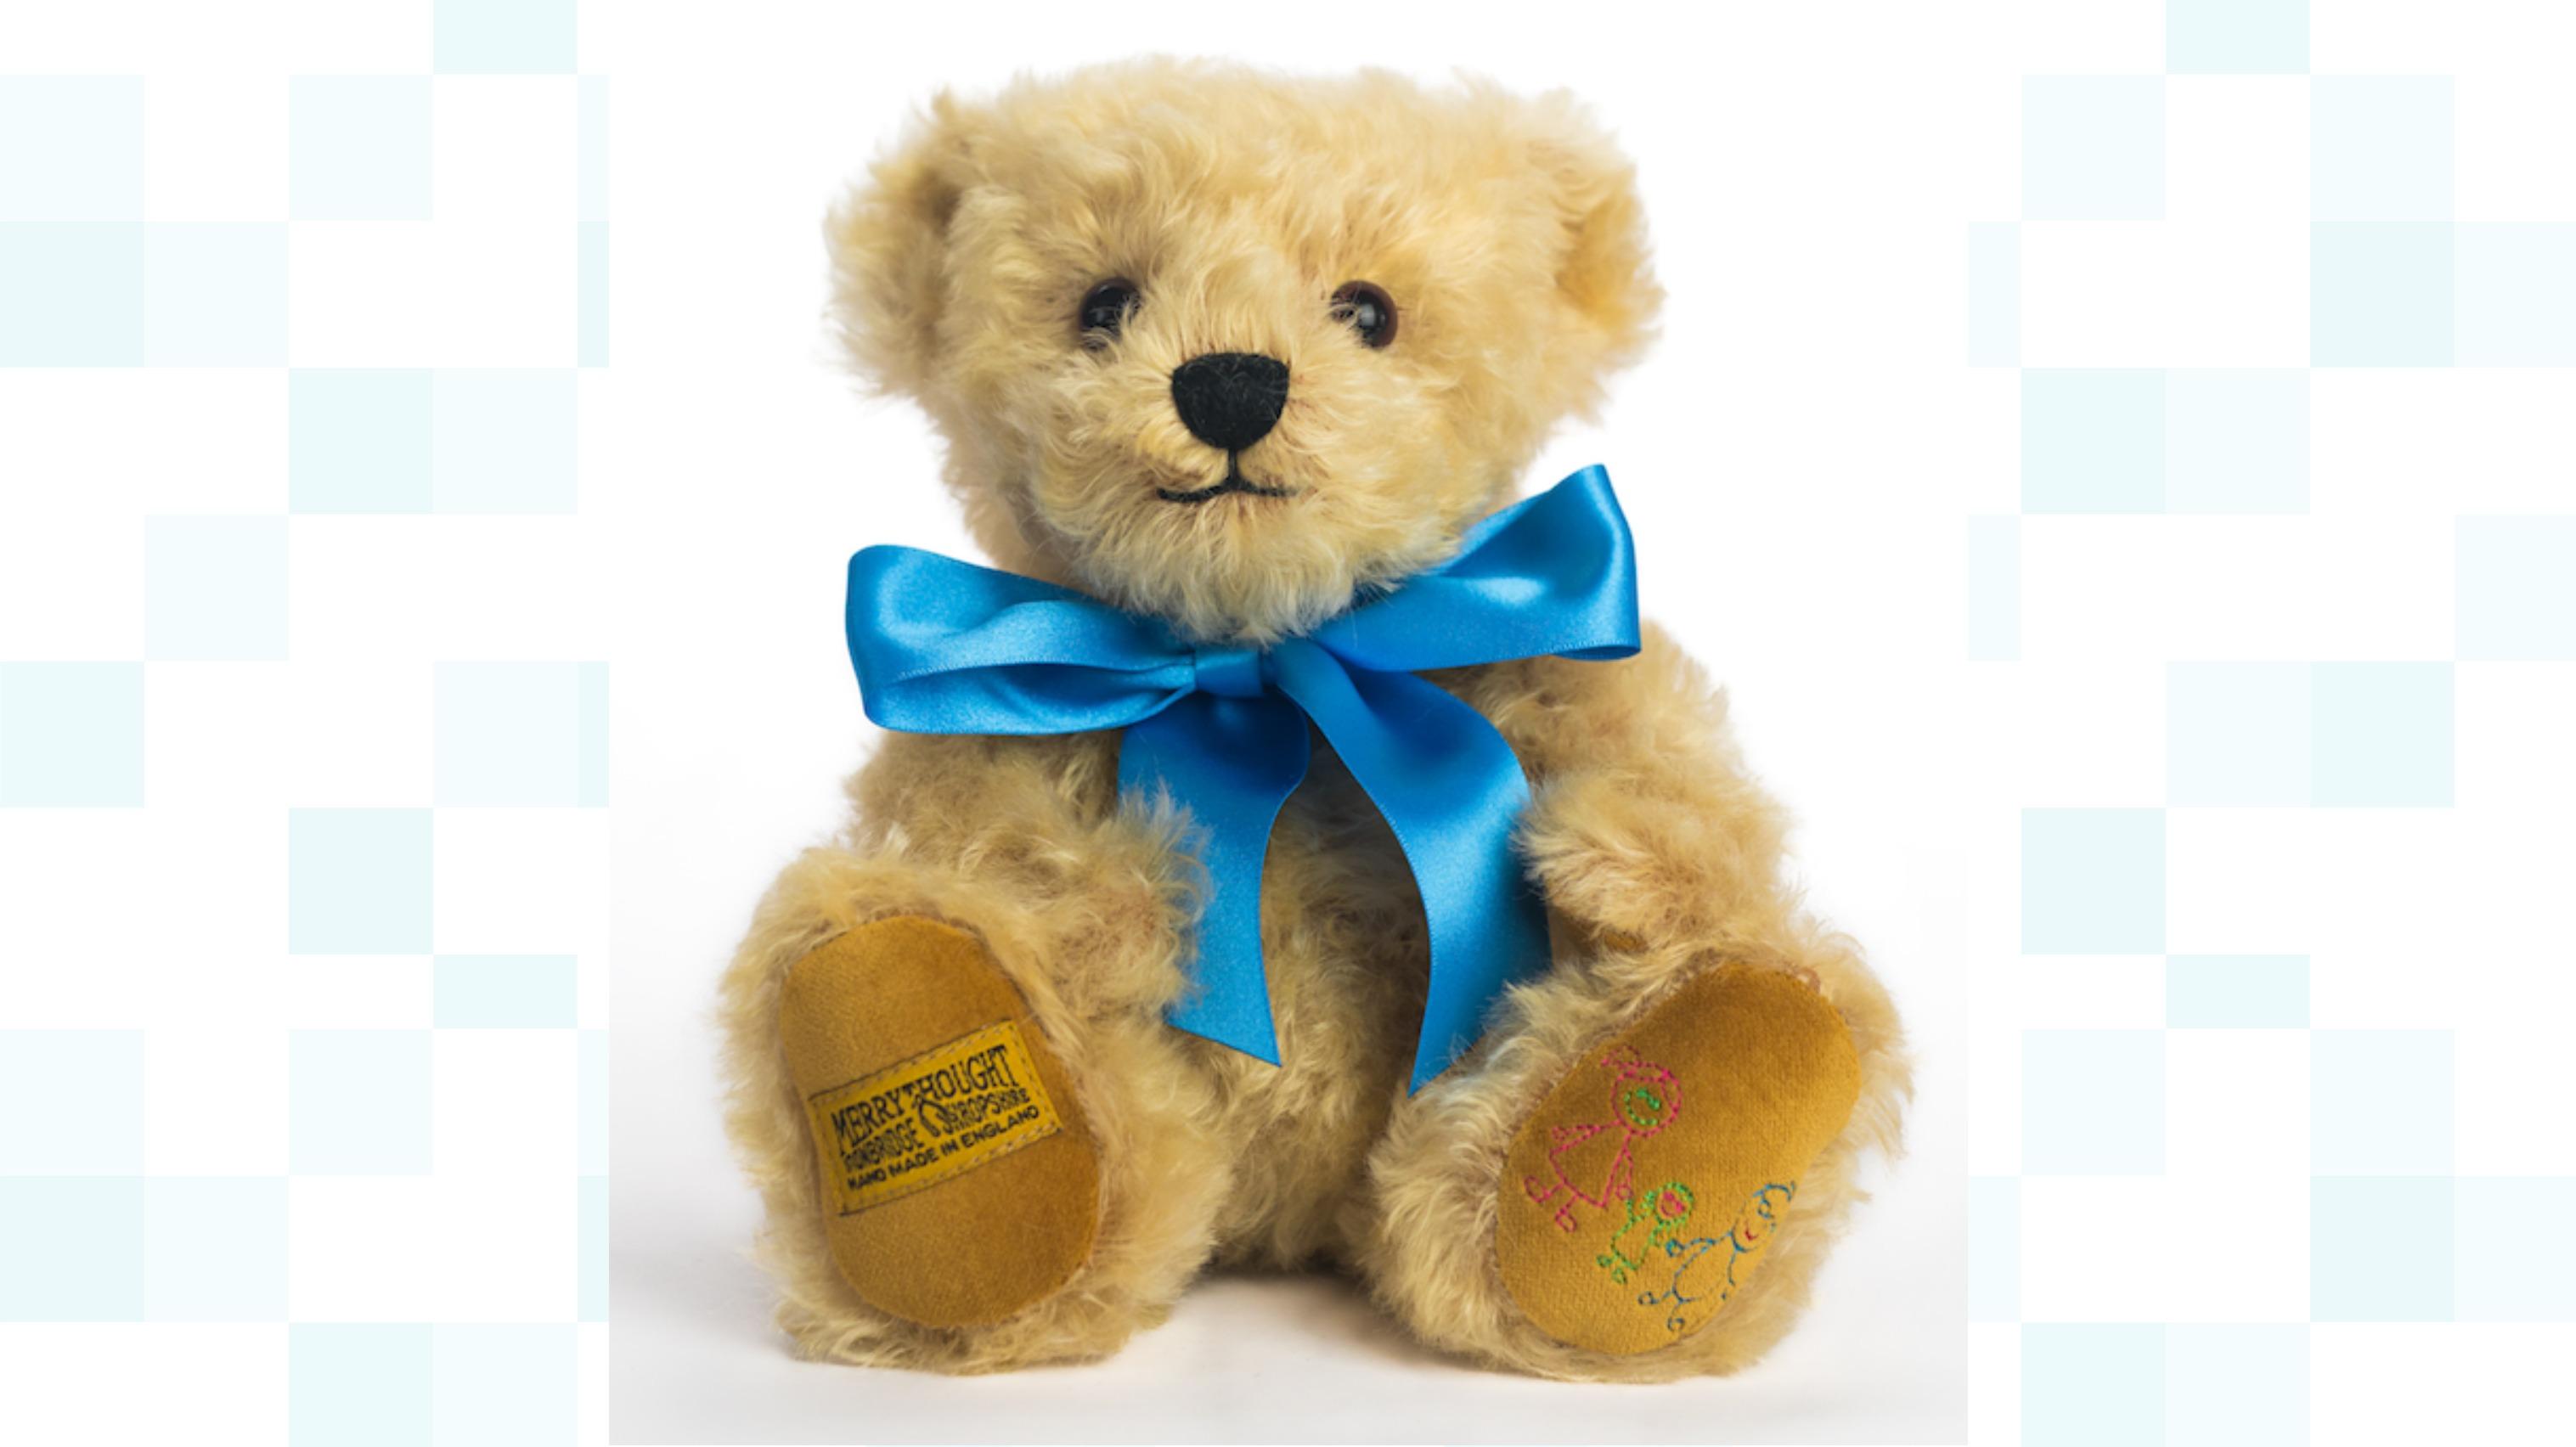 Teddy Cares NHS ANGEL Teddy Bear 2020